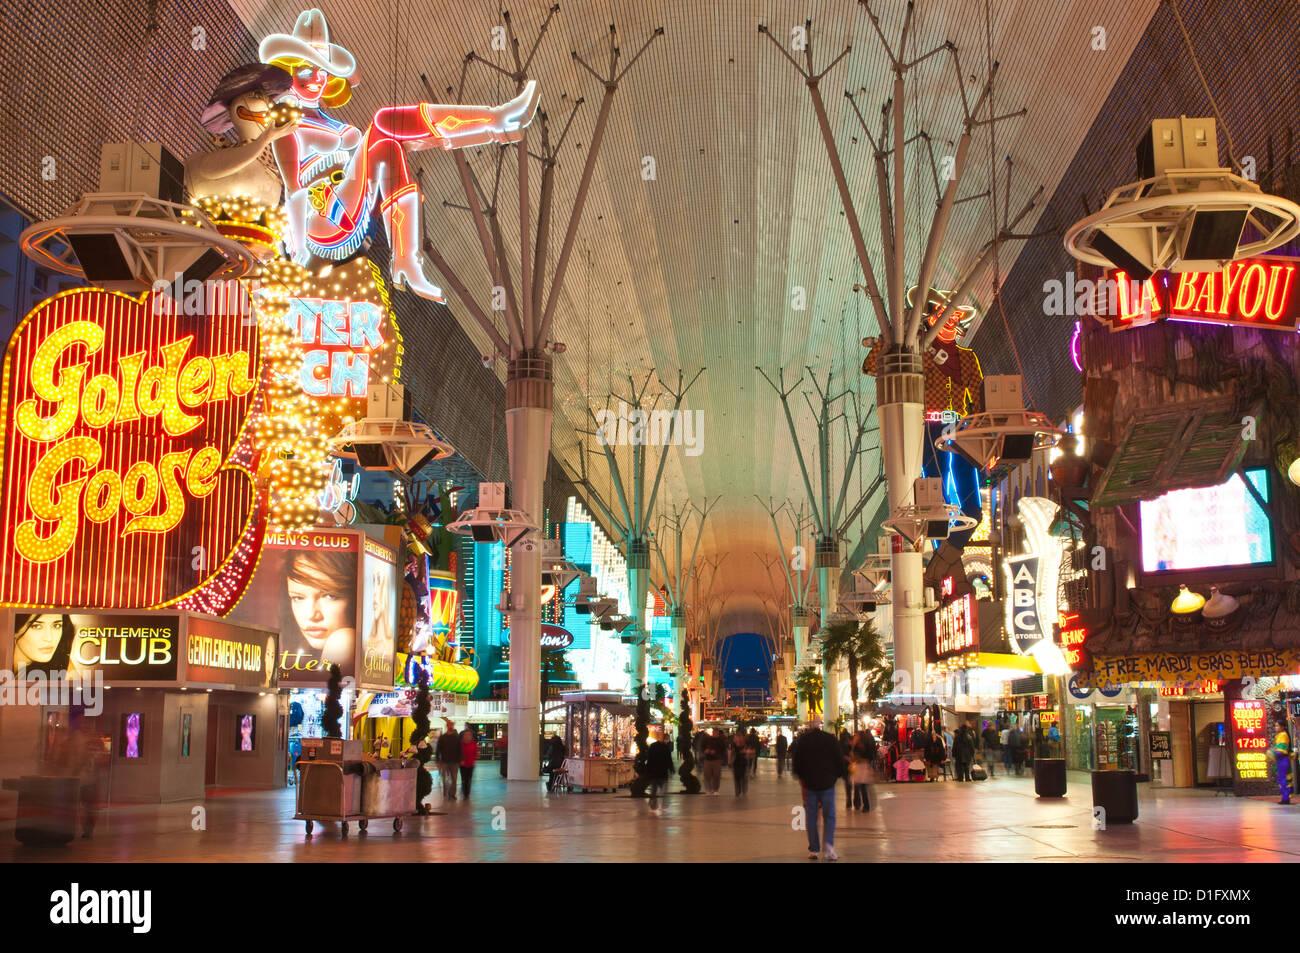 Fremont Street Experience, Las Vegas, Nevada, Stati Uniti d'America, America del Nord Foto Stock